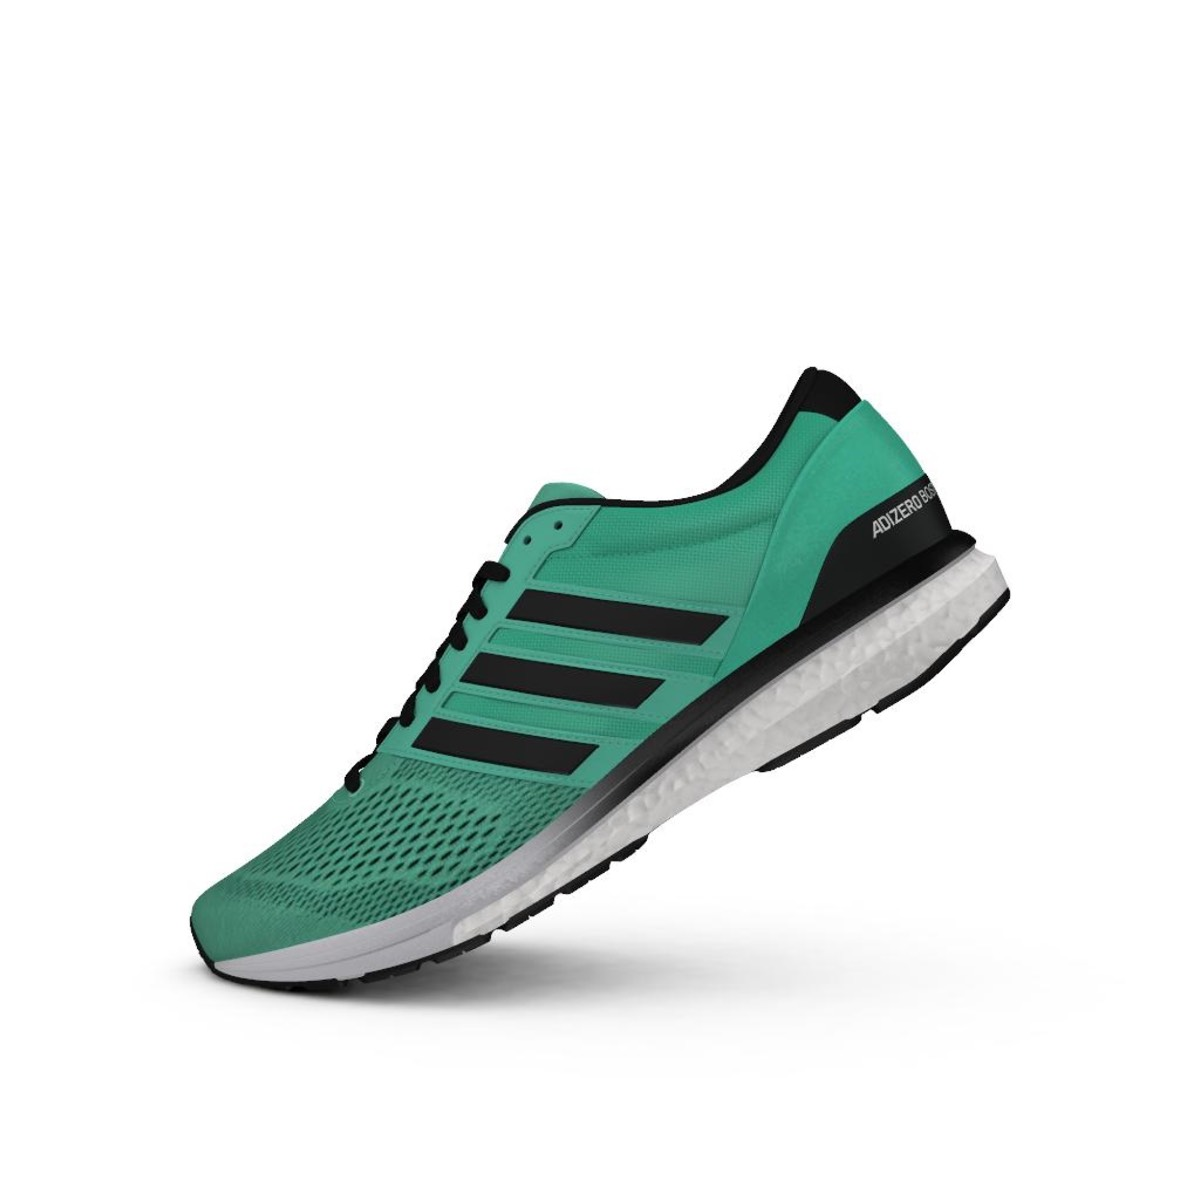 sports shoes 75846 4a92a BlackFtwr Boston Hi Green M 6 White S18Core Adidas Res Adizero A8qFPP